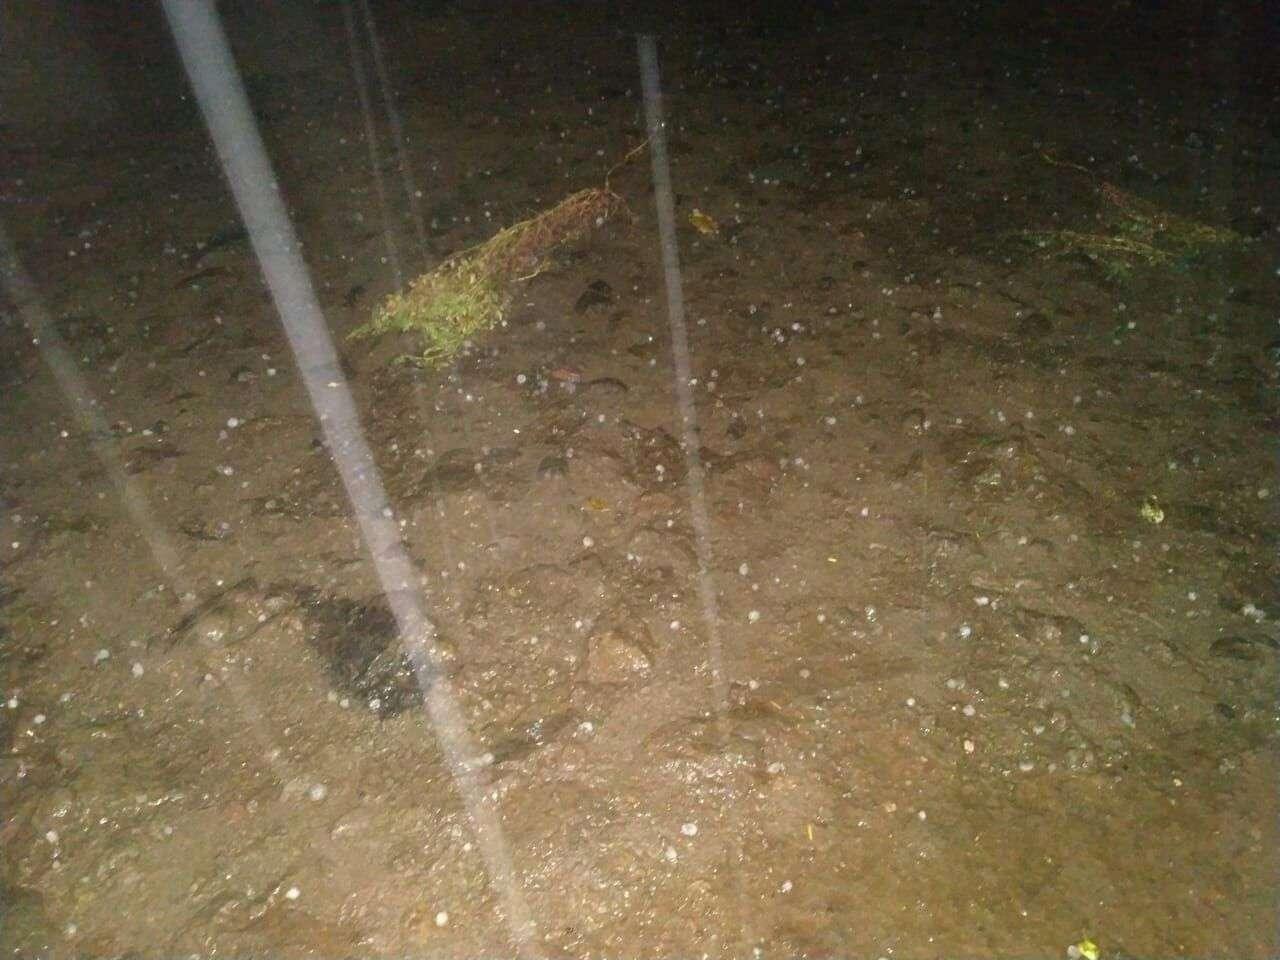 बारिश के साथ हुइ ओलावृष्टि